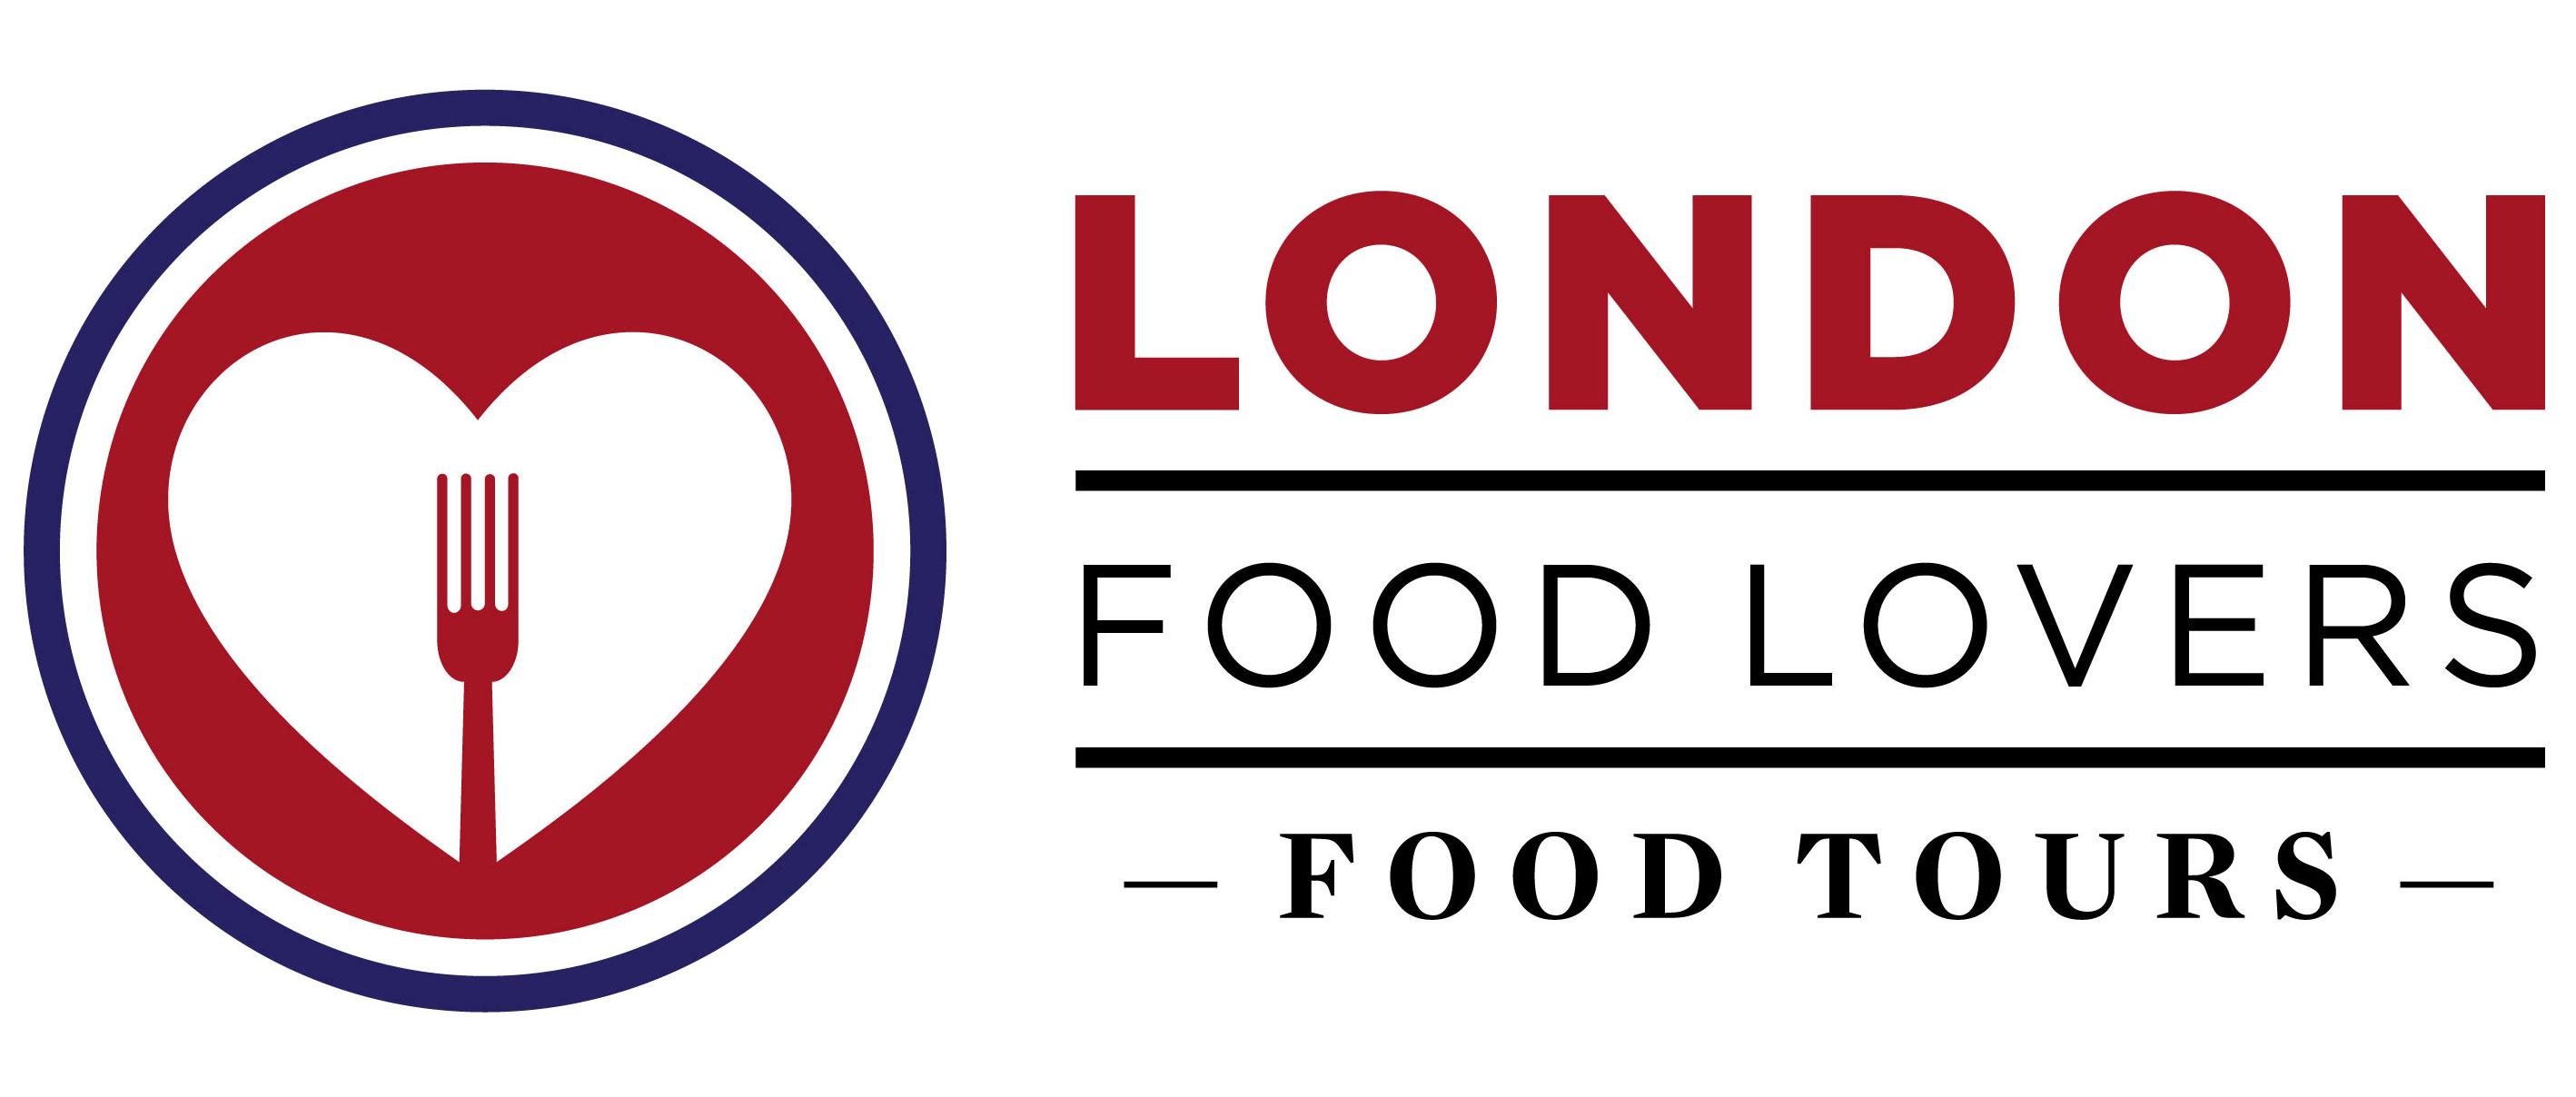 Food Lovers Tours, Ltd.